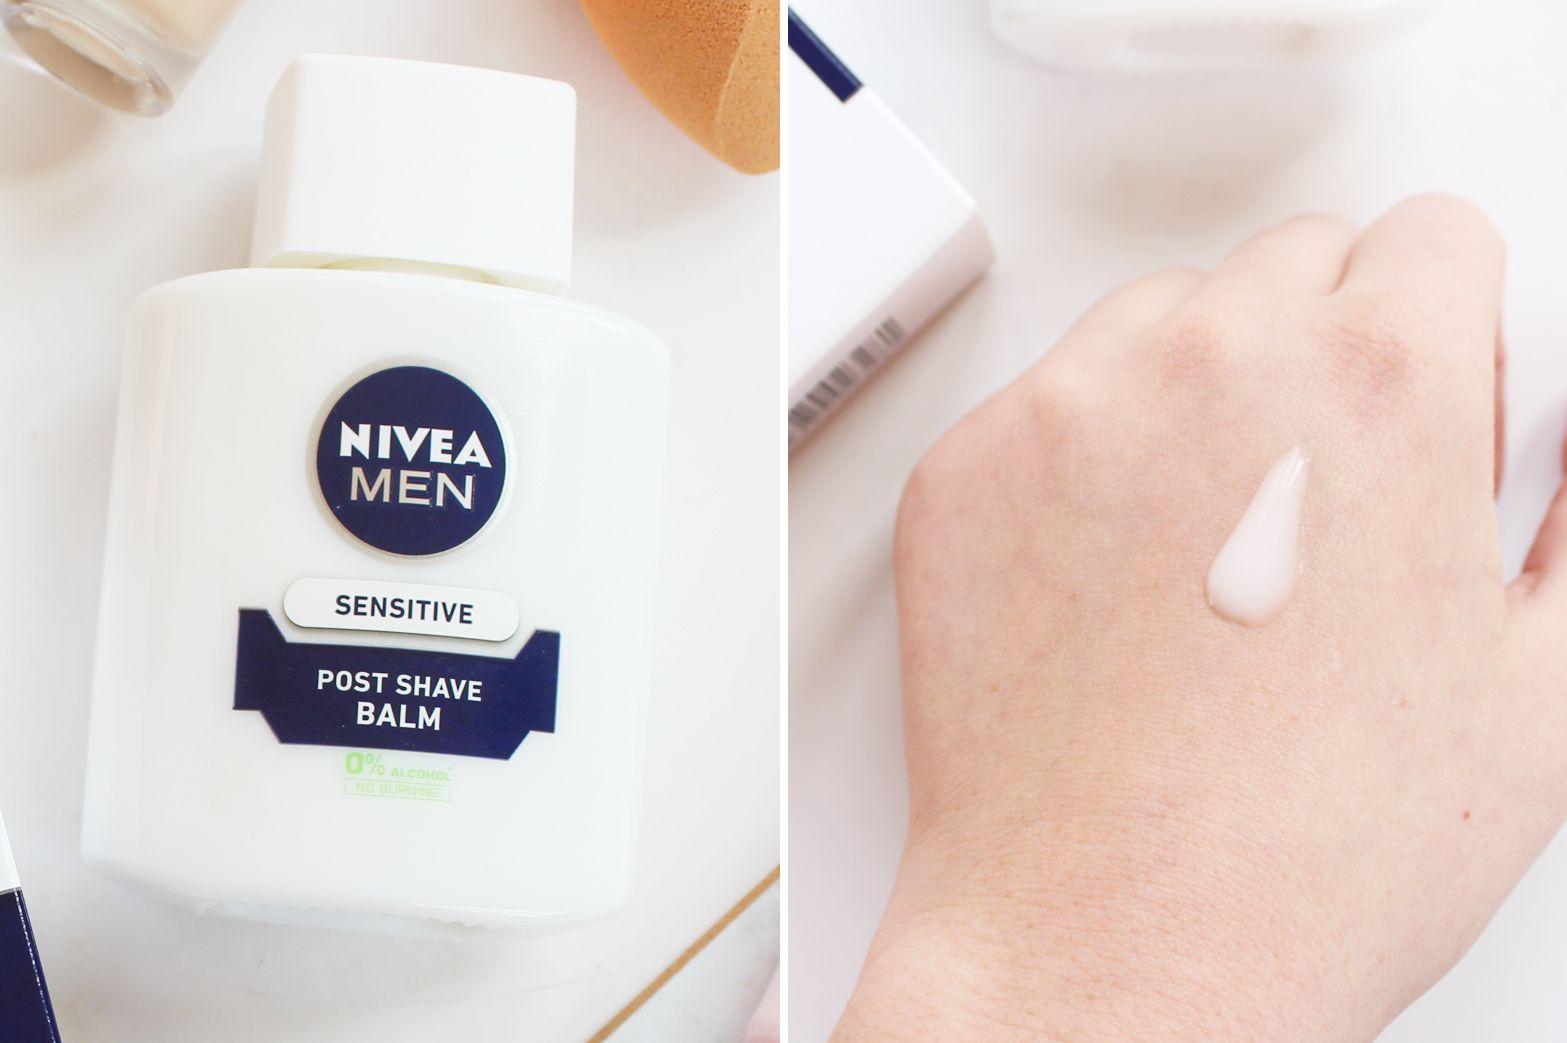 Can A Mens Post Shave Balm Really Work As Primer Make Up Likes Moreskin Loose Powder Ivory Bright Nivea